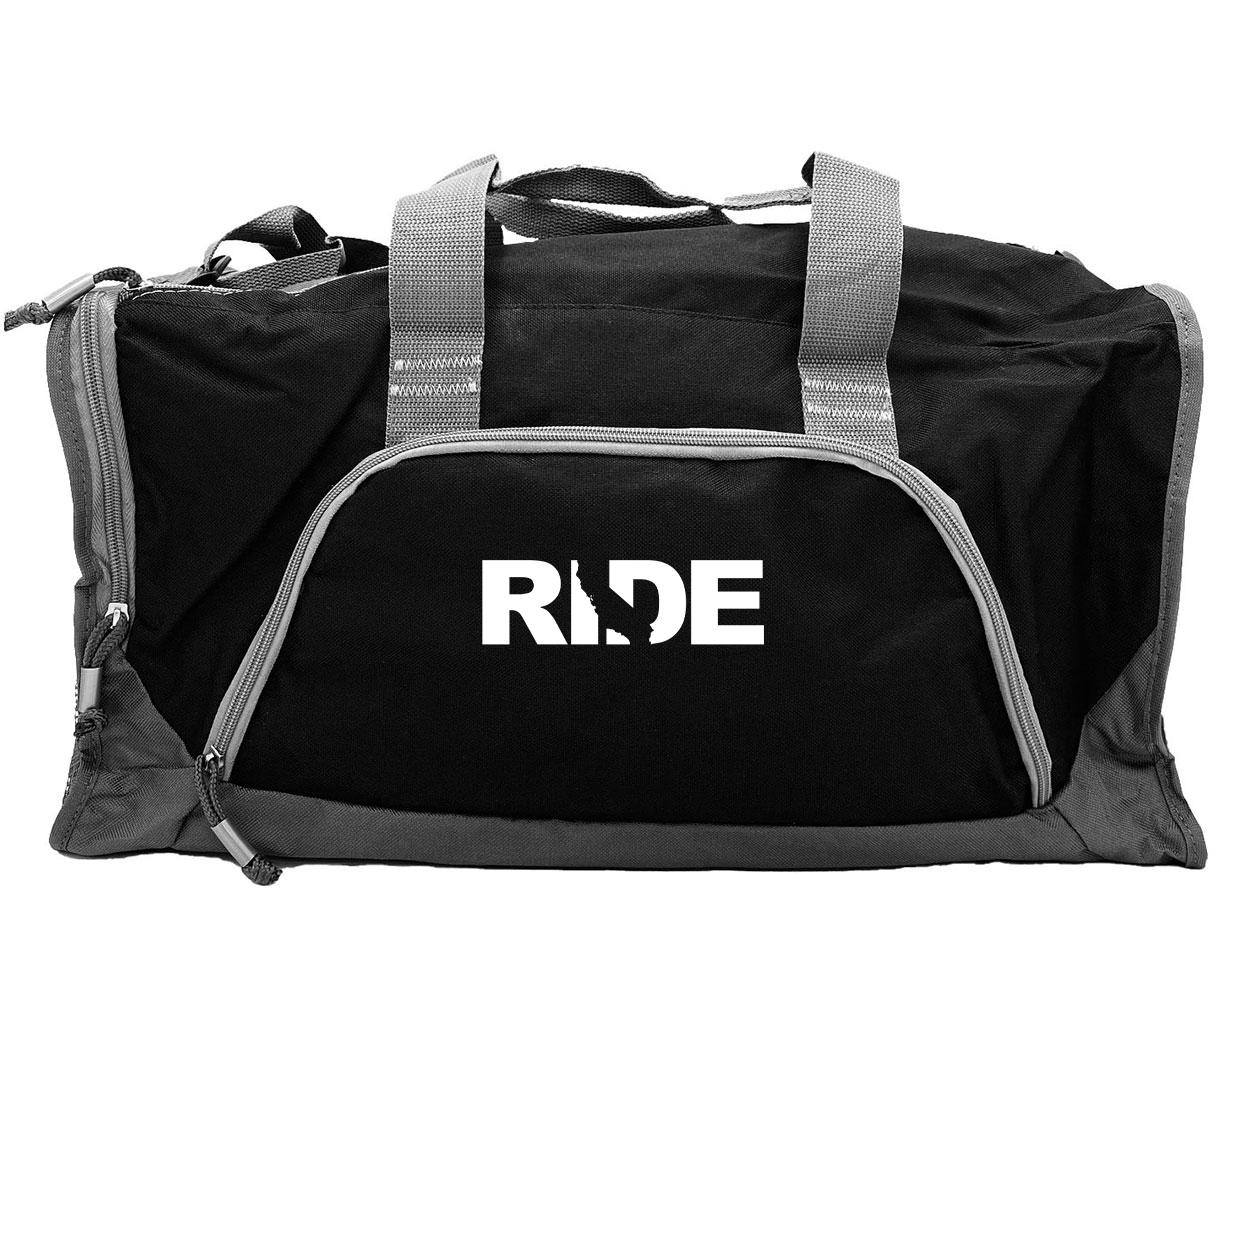 Ride California Classic Rangeley Sport Duffel Bag Black (White Logo)